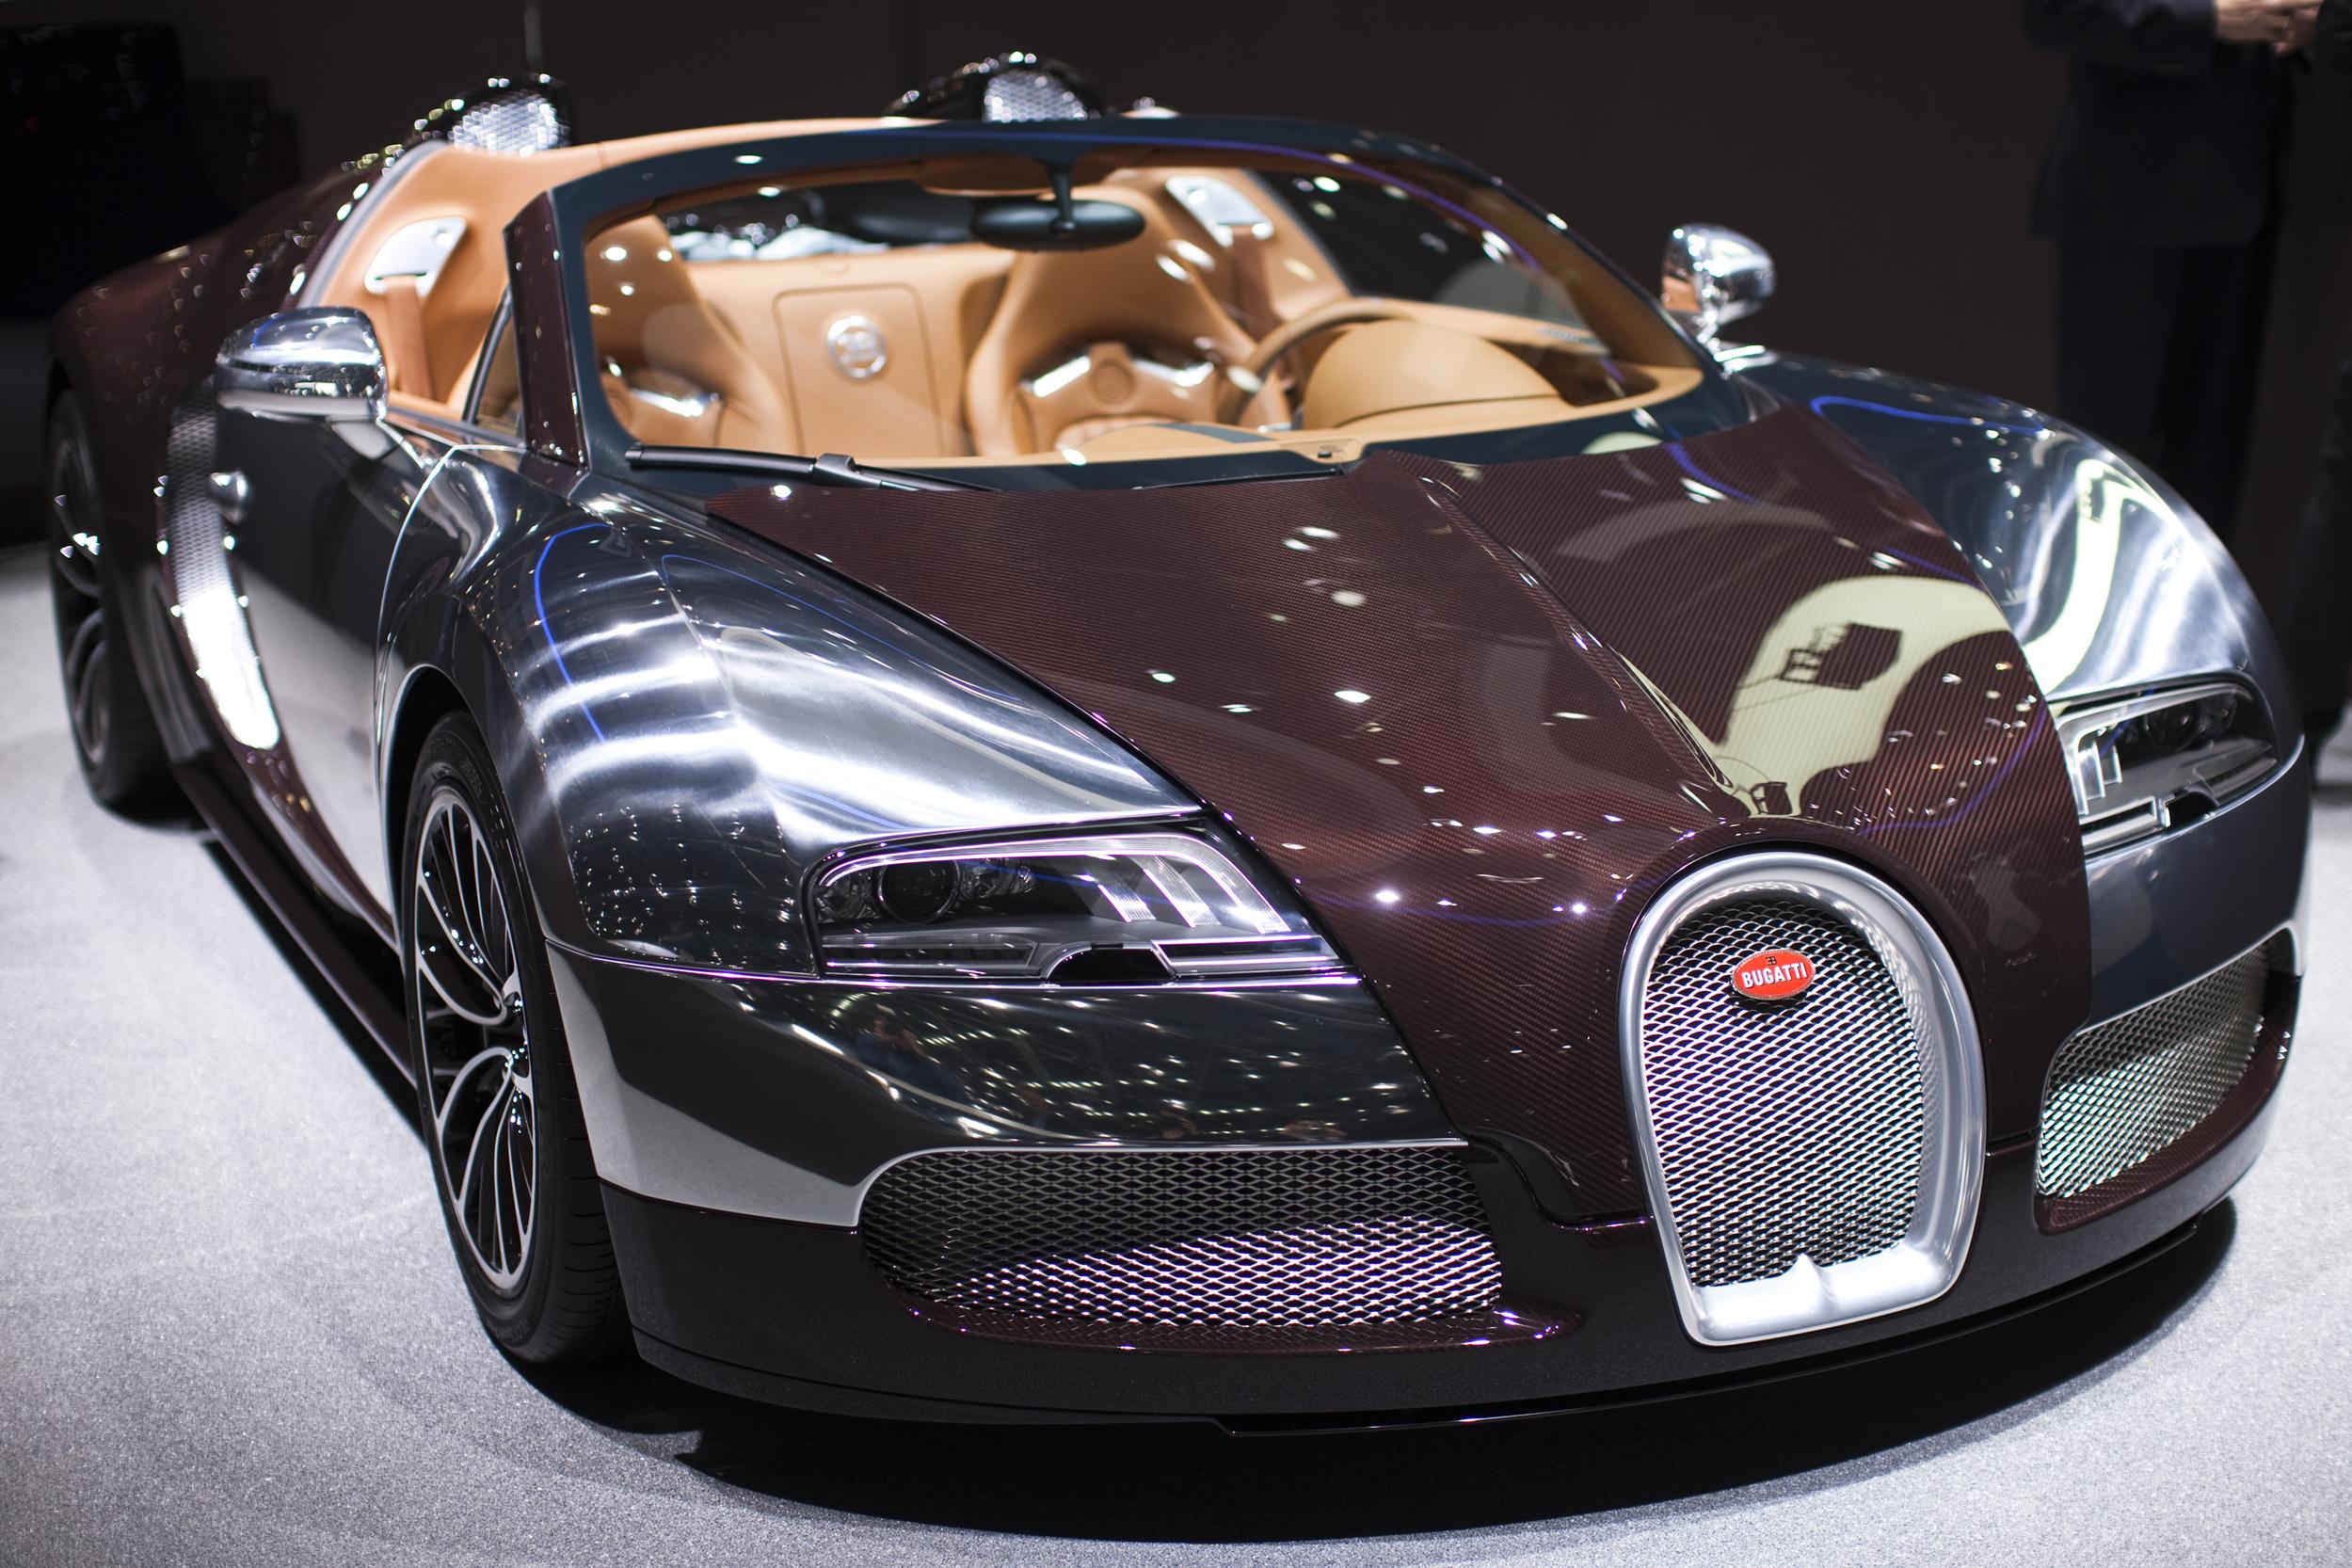 gold bugatti photos video flo rida wraps 17 million car in gold - Bugatti 2016 Gold